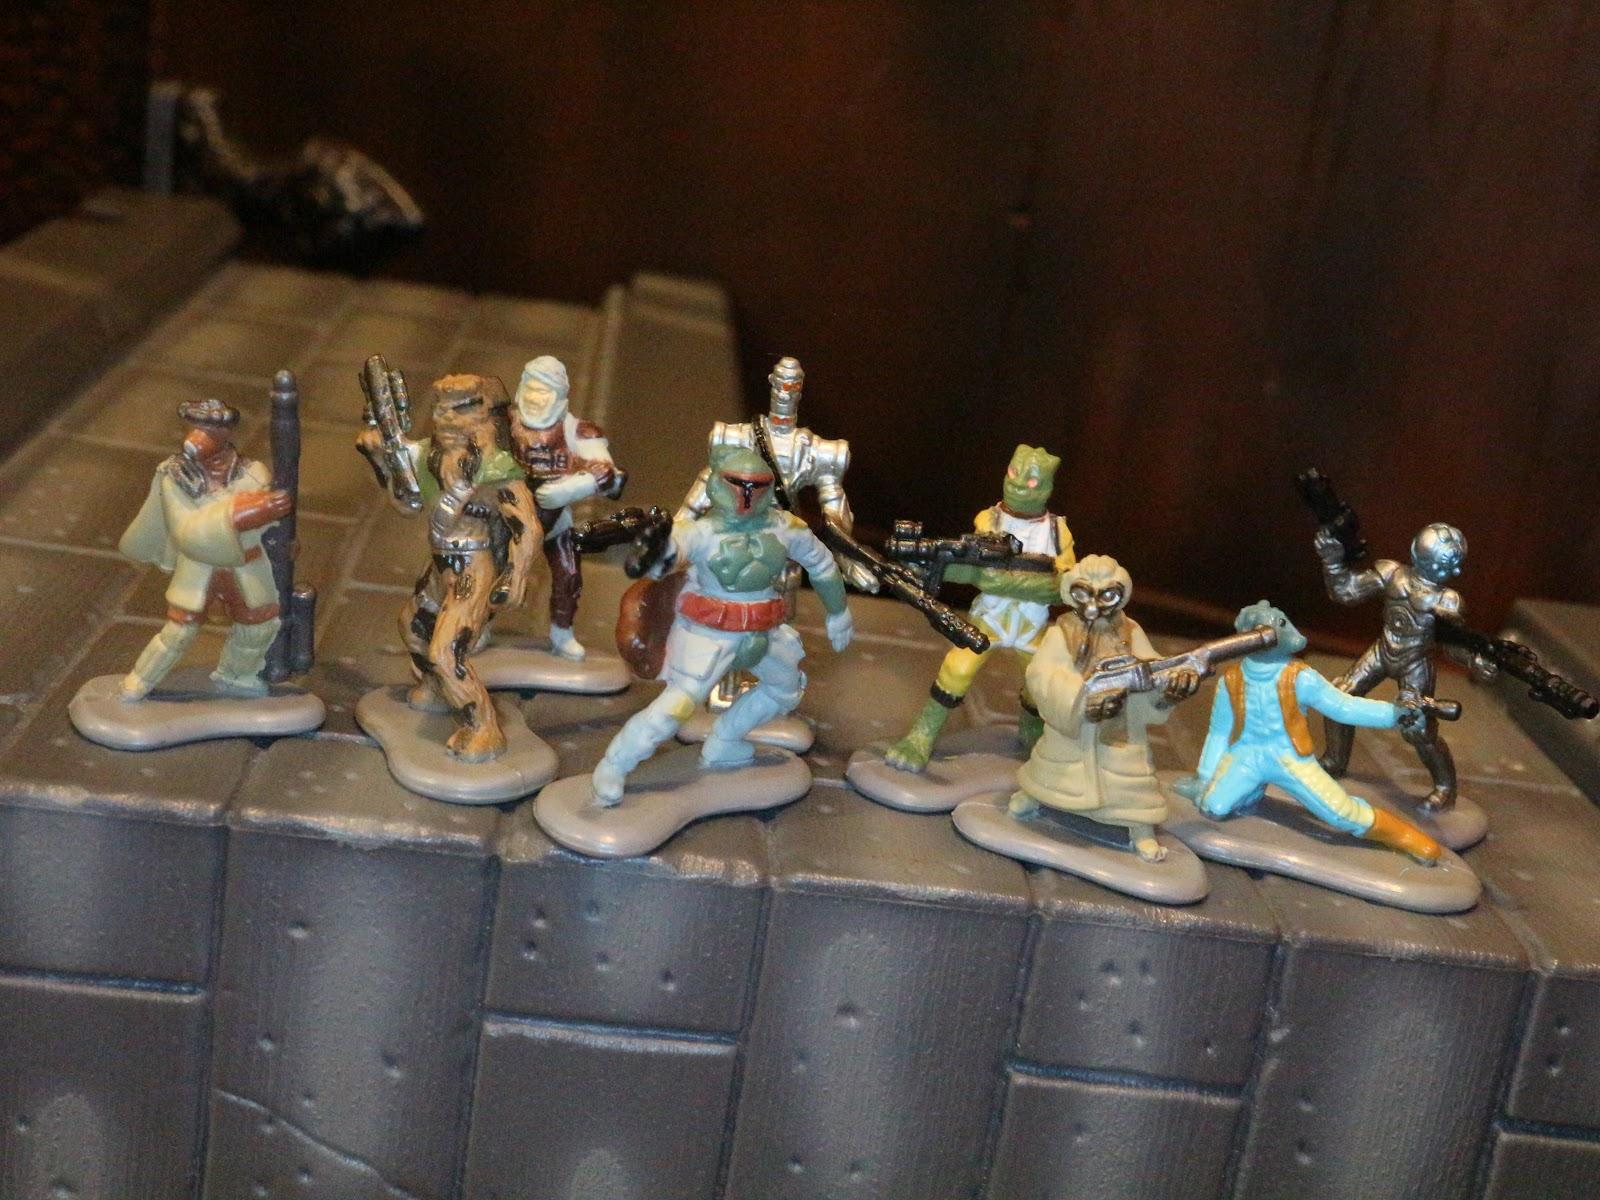 STAR WARS MICRO MACHINES FIGURE BOSSK BOUNTY HUNTER # 1